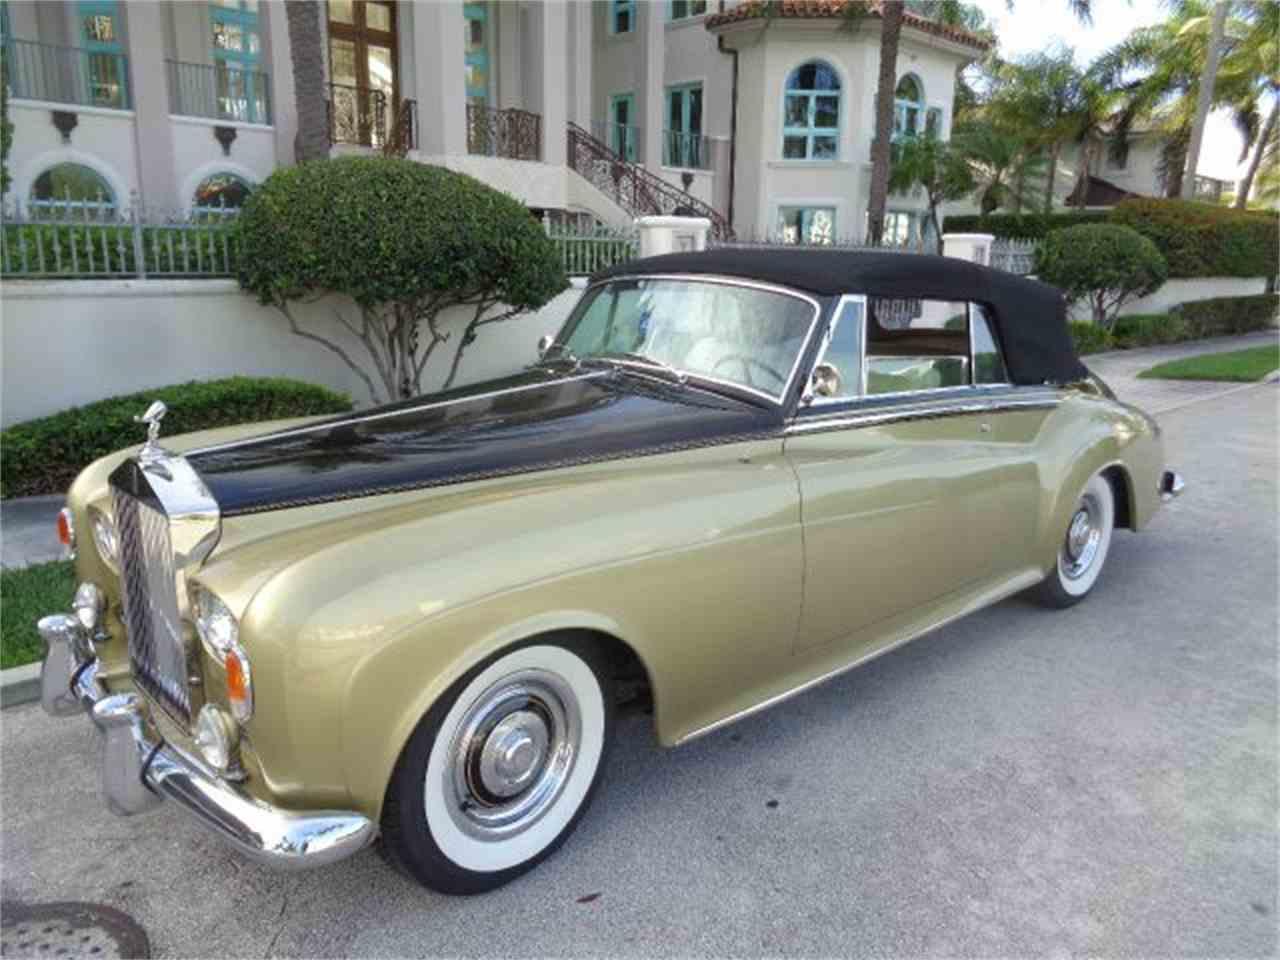 1963 rolls royce silver cloud iii for sale cc 653193. Black Bedroom Furniture Sets. Home Design Ideas